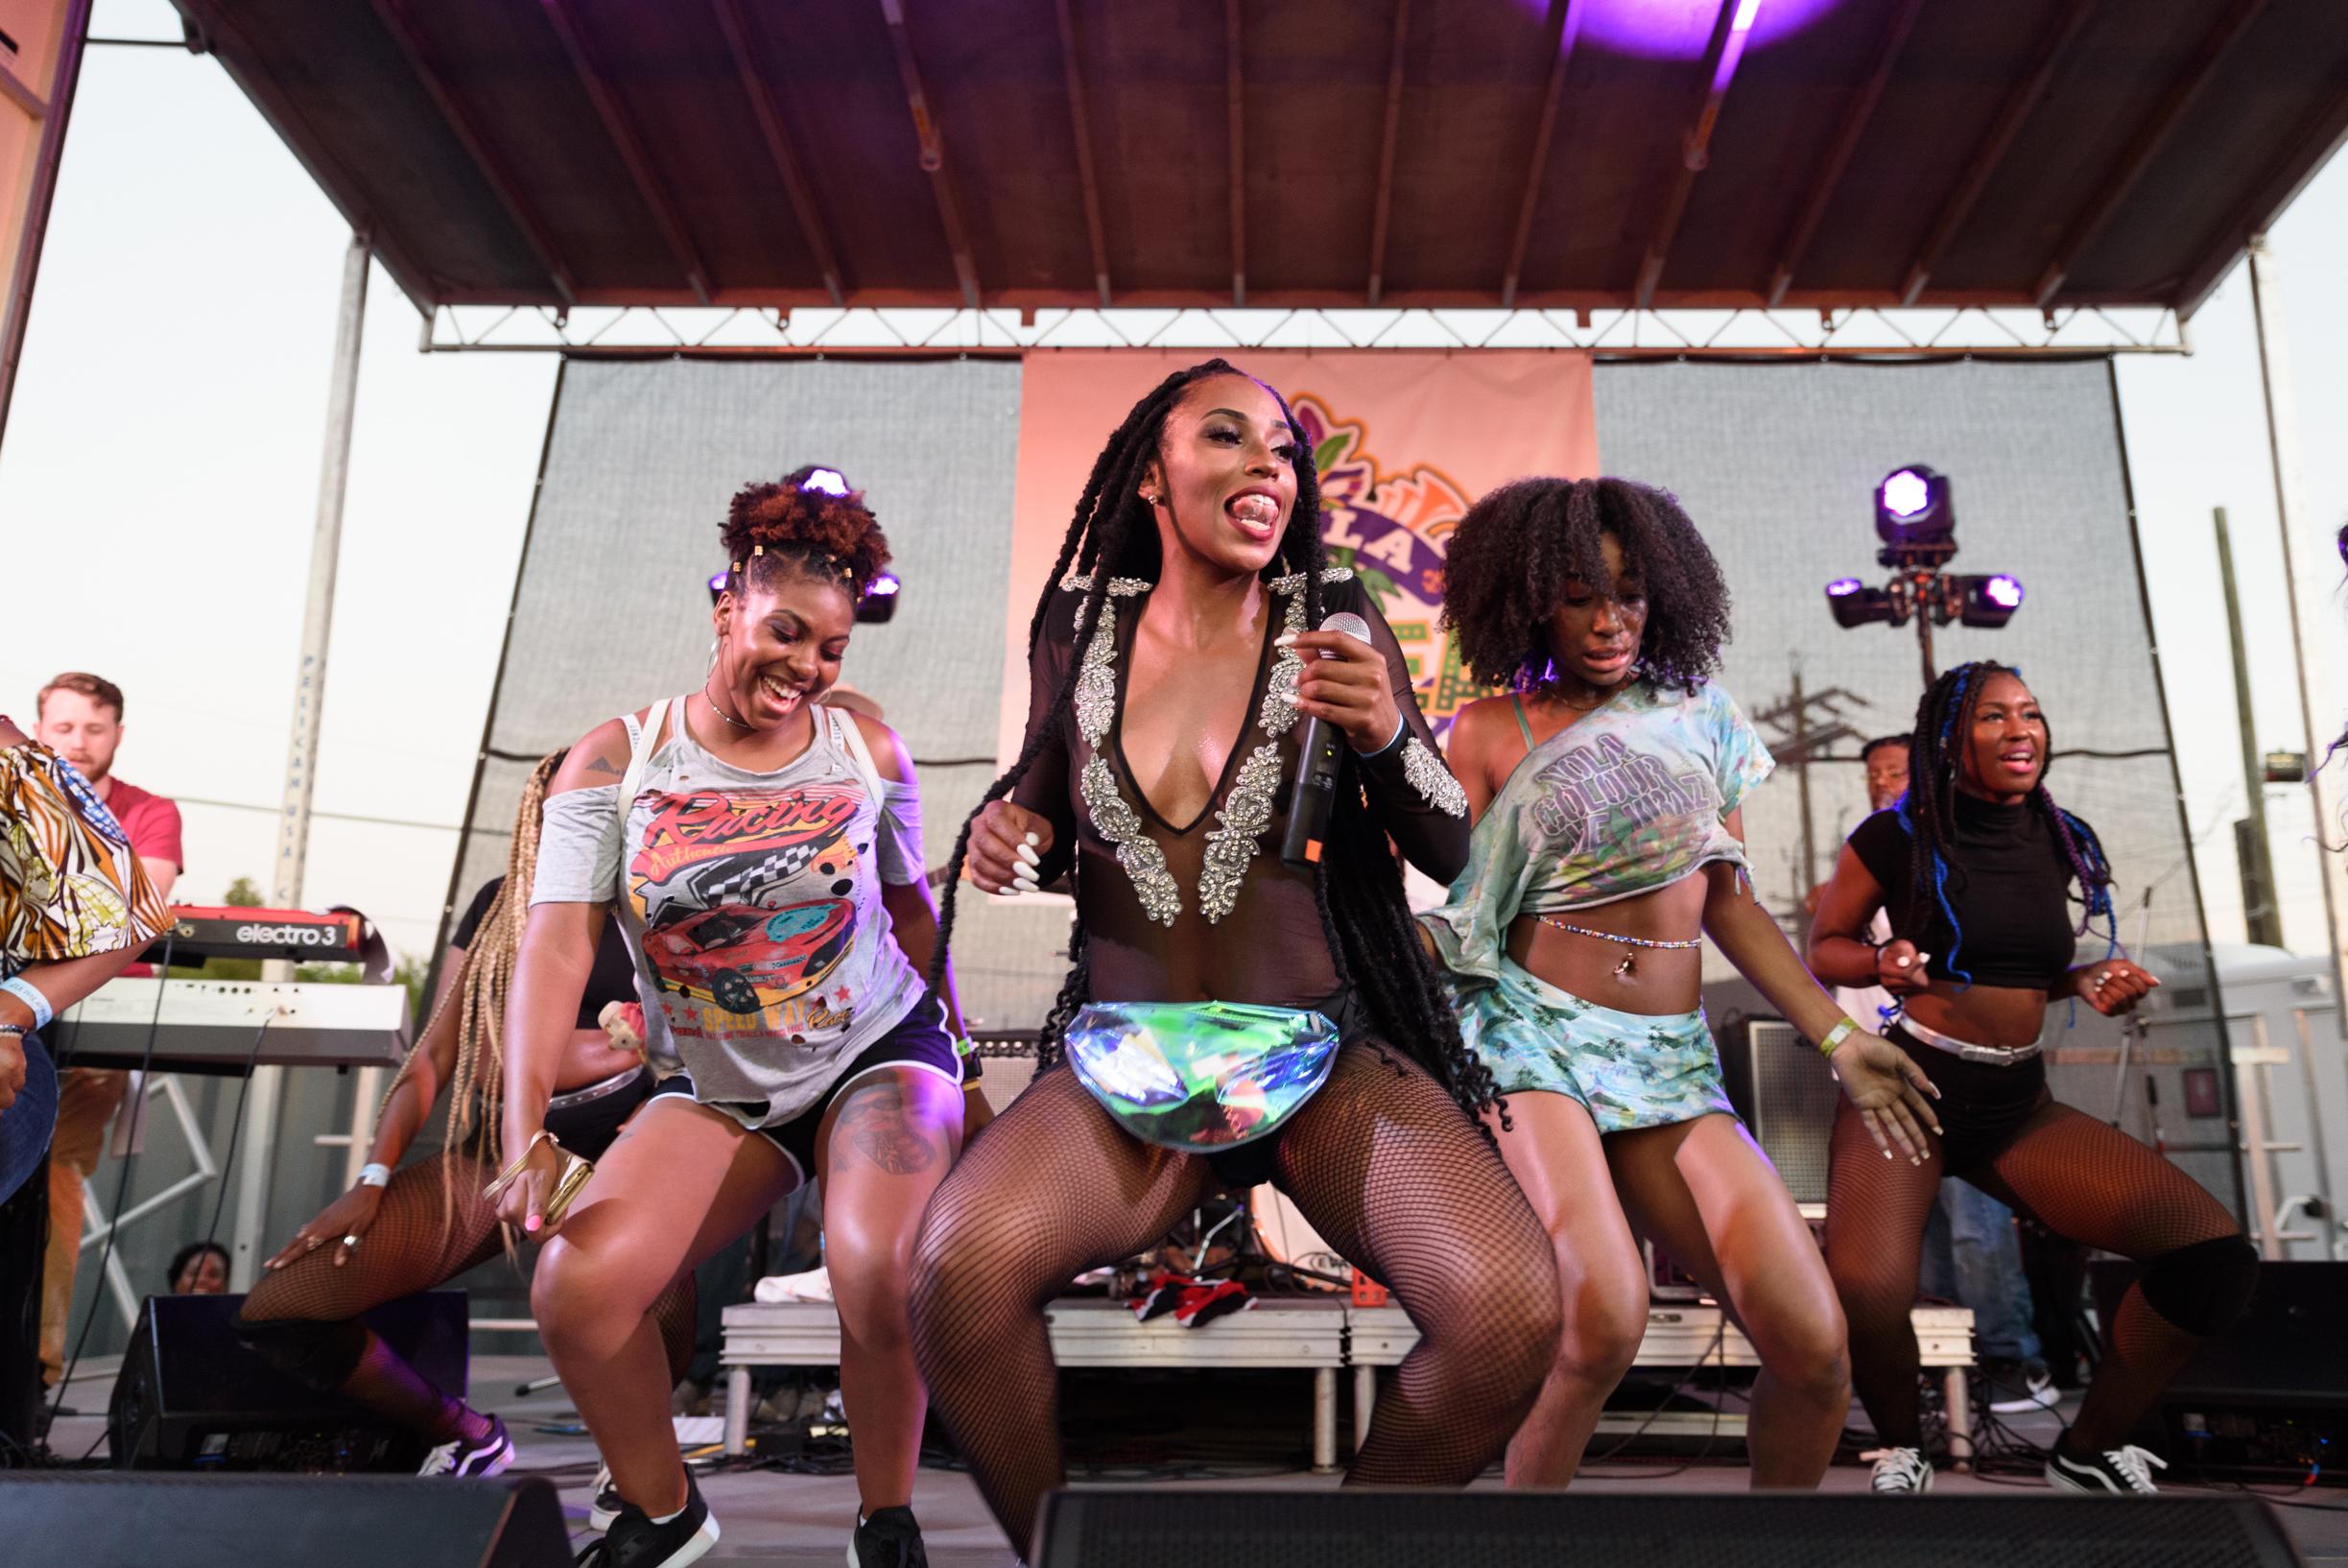 carnival new orleans nola caribbean festival soca reggae music dance